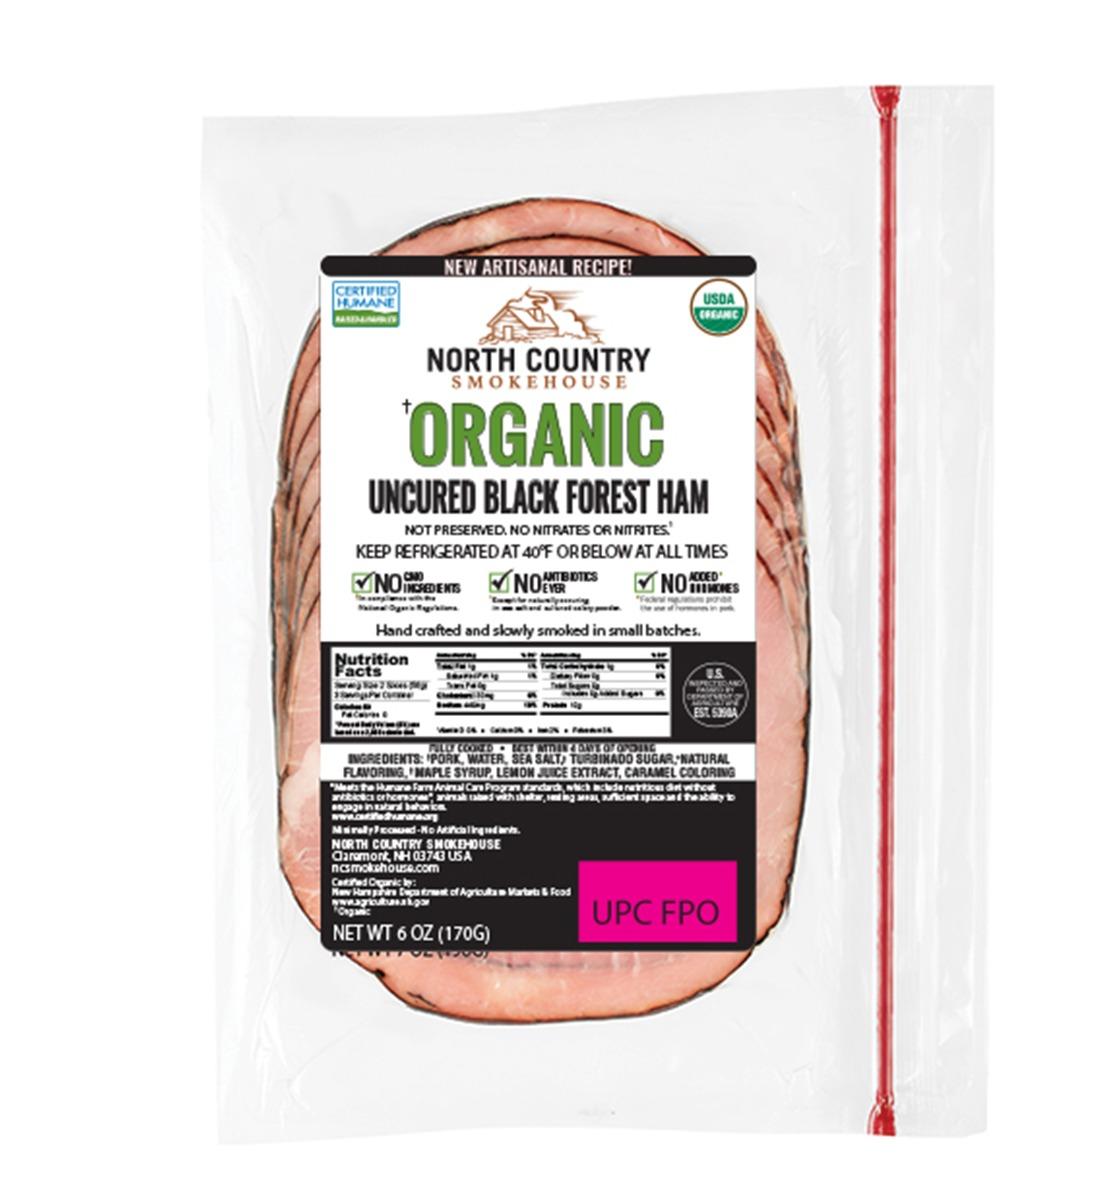 Organic Black Forest Deli Ham - 3, 6 oz. packages